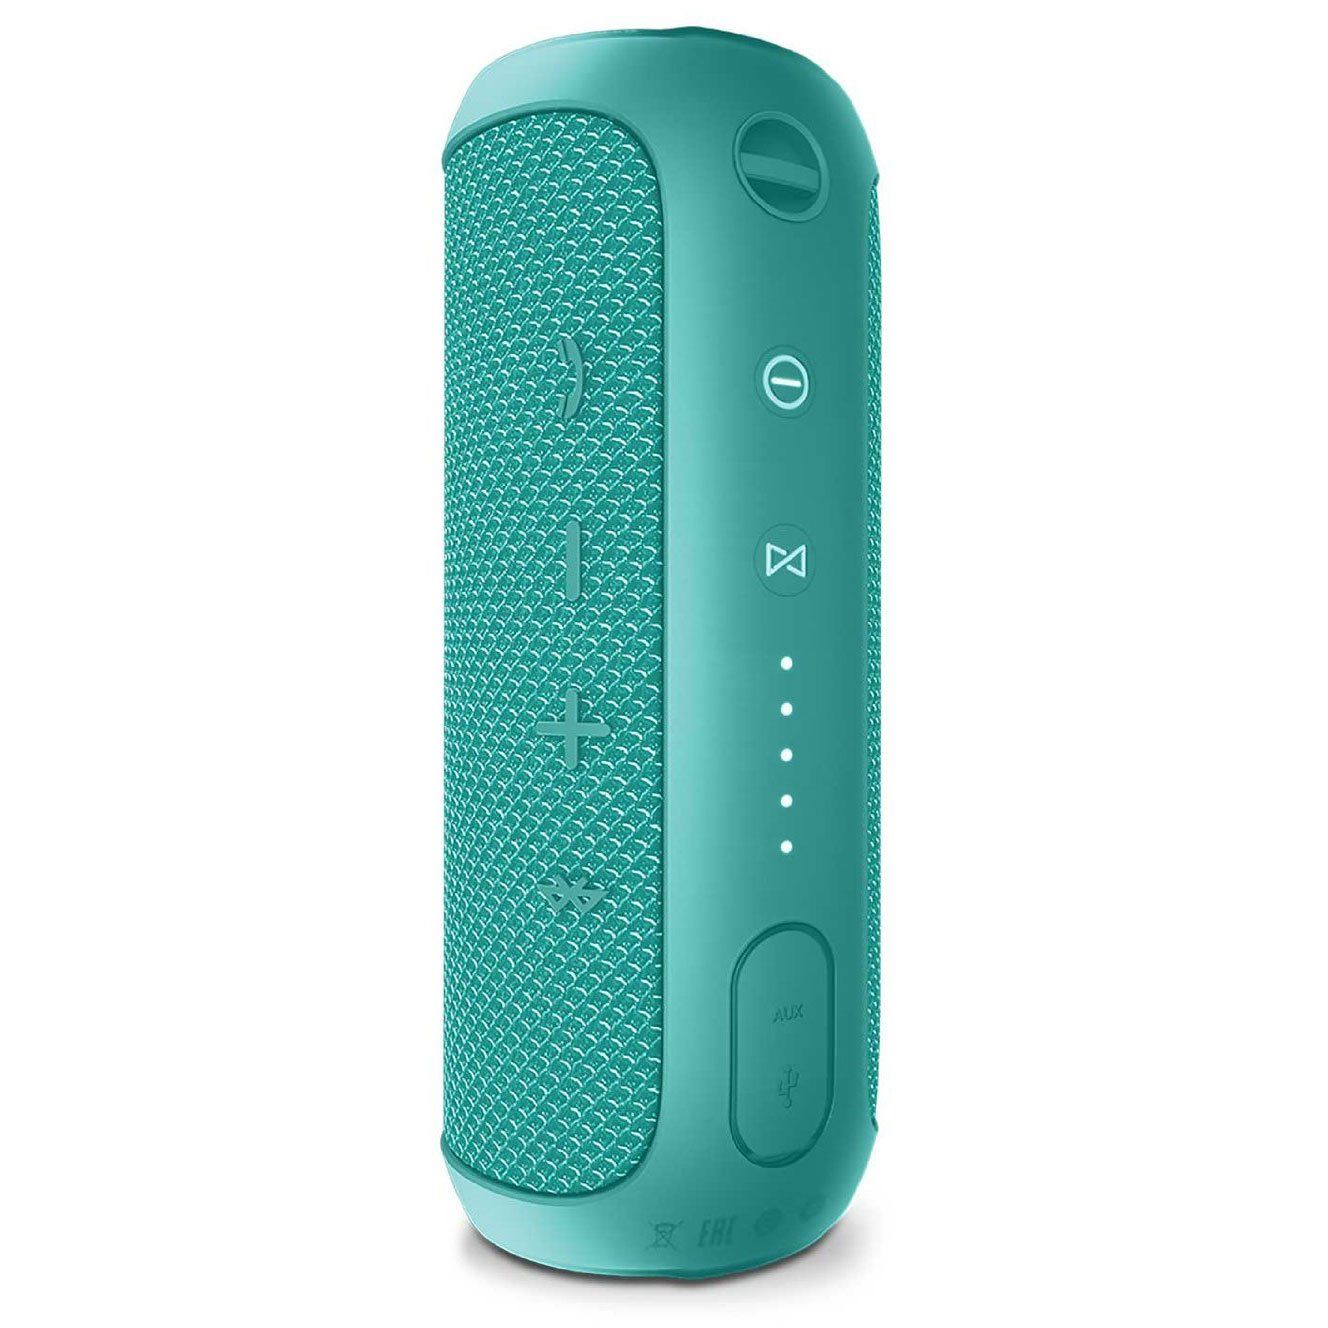 Amazon Com Jbl Flip 3 Splashproof Portable Bluetooth Speaker Teal Electronics Cool Tech Gifts Tech Gifts Bluetooth Speakers Portable